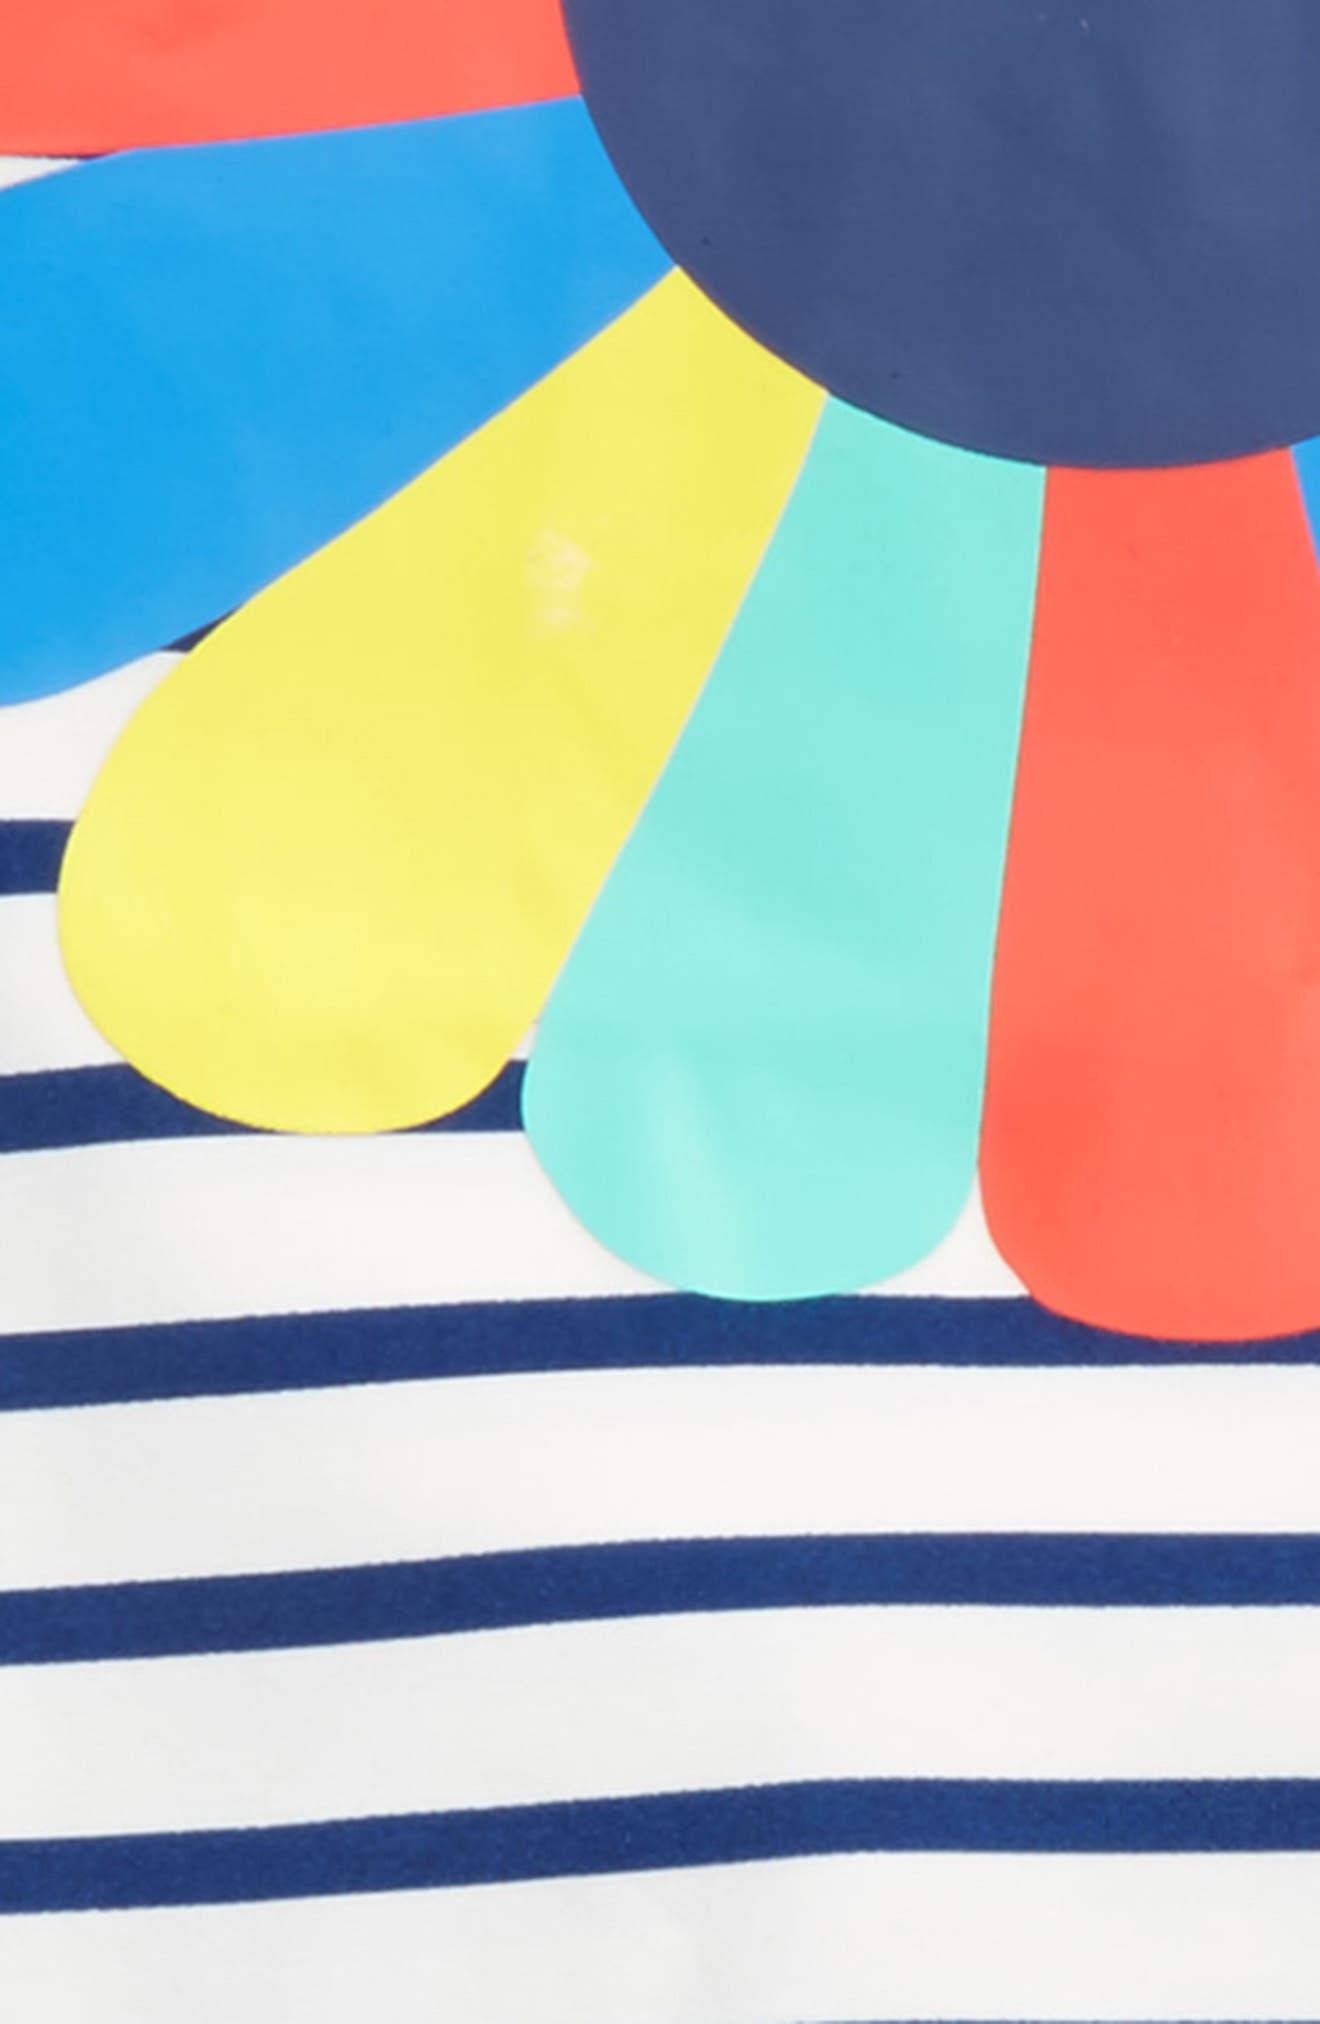 Sea Explorer Two-Piece Rashguard Swimsuit,                             Alternate thumbnail 2, color,                             Ivory/ Deep Sea Blue/ Flower